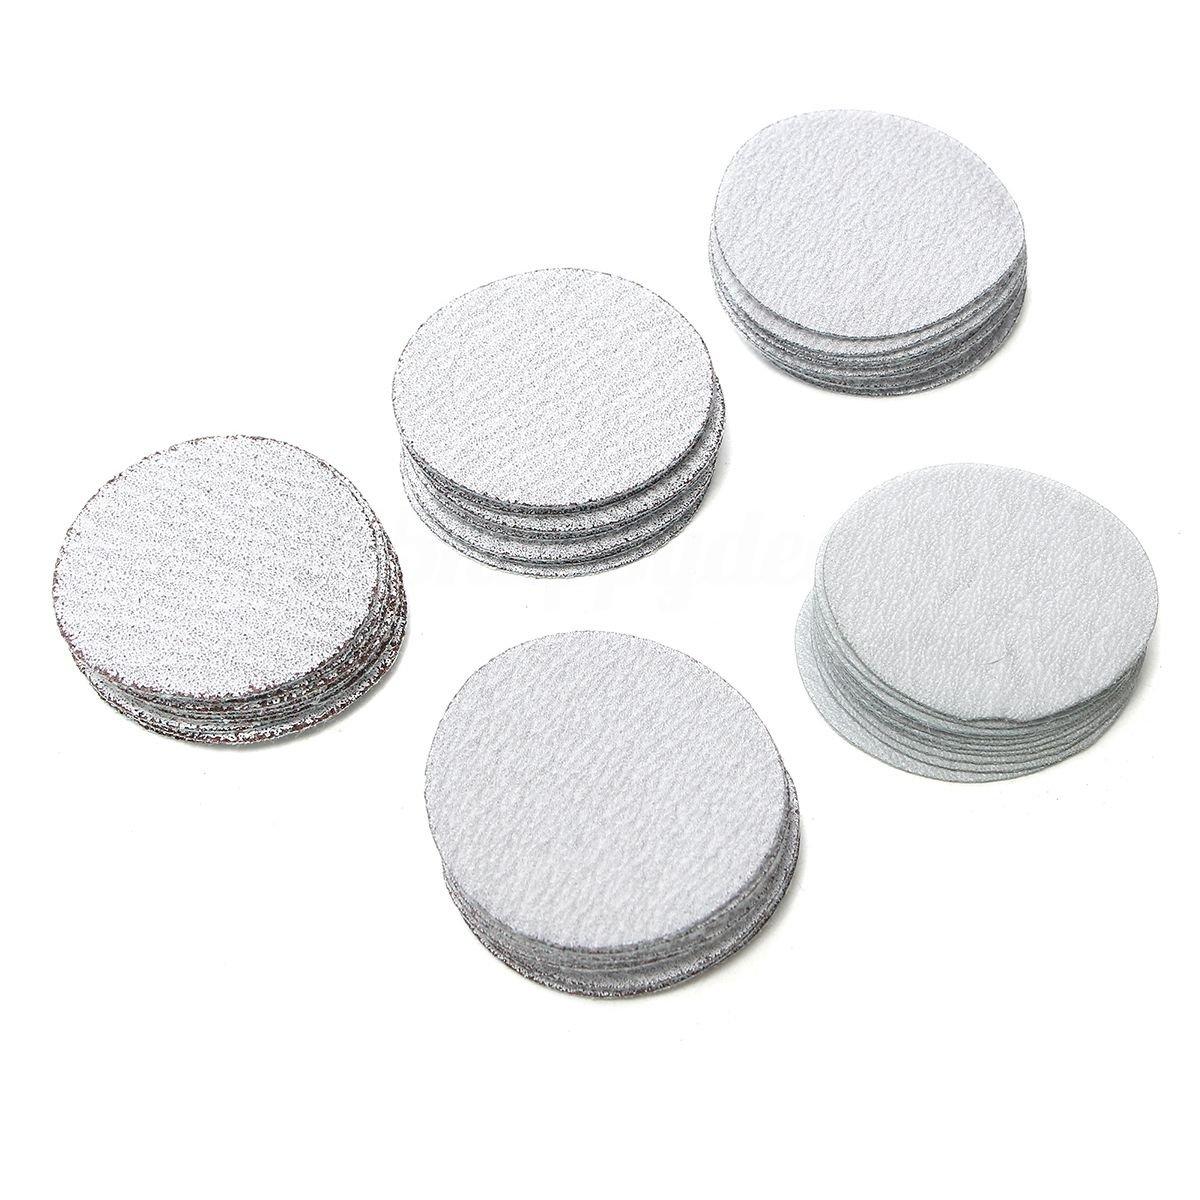 TOOGOO 2inch 50mm Sanding Discs Hook and Loop Pack of 50 mixed 80 120 180 240 400 Grits